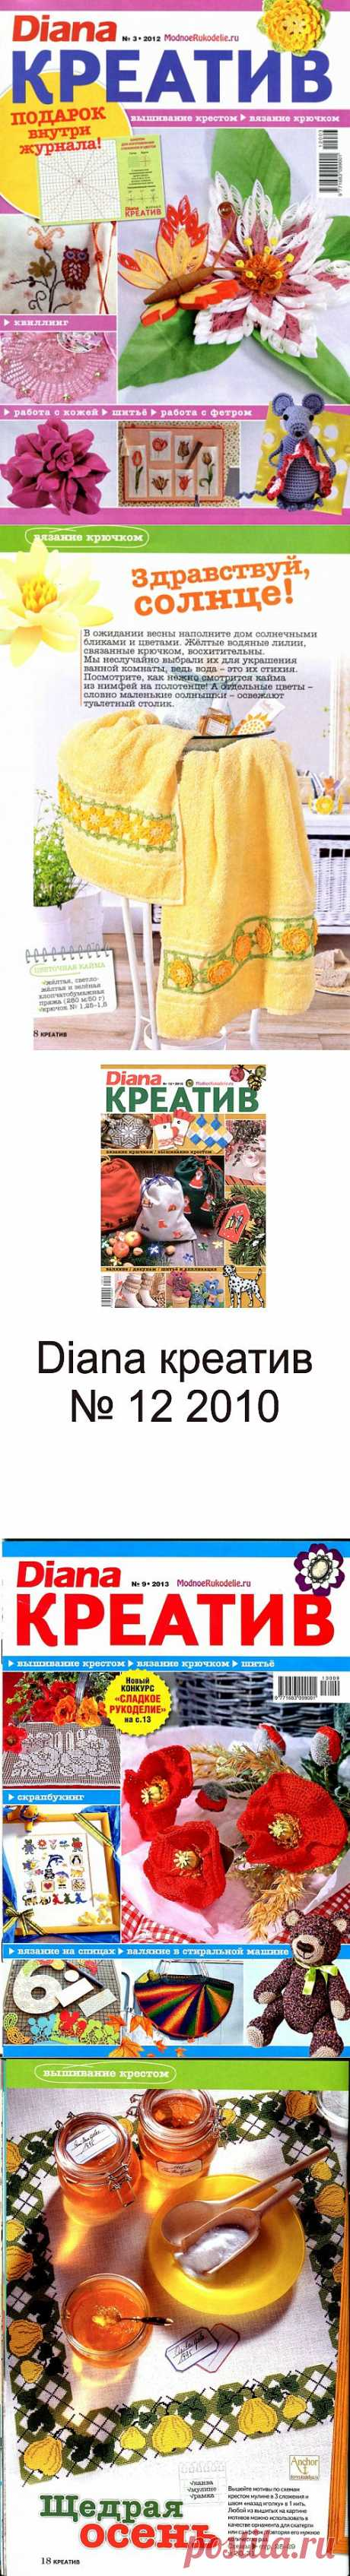 Diana a creative - mad1959 — я.ру